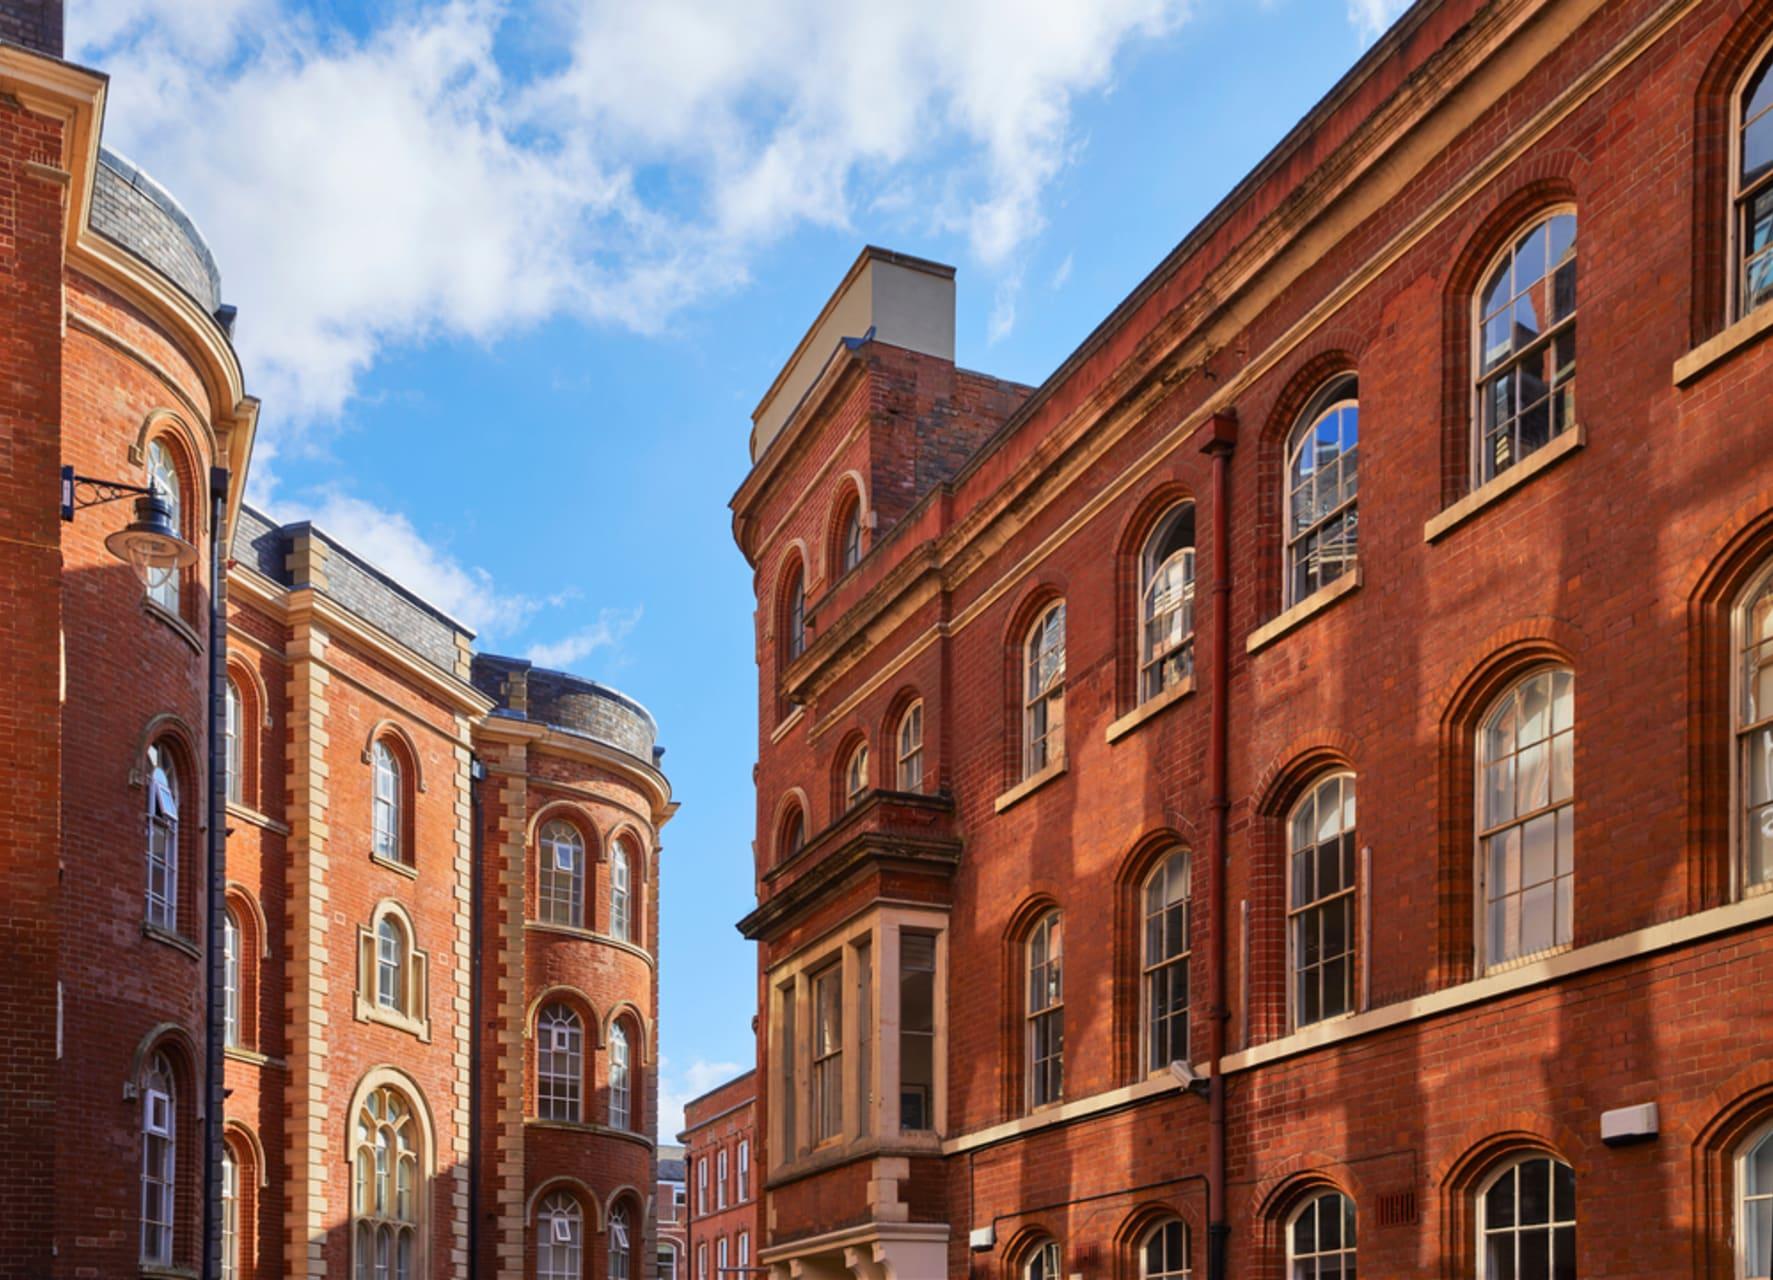 Nottingham - Where The City Began